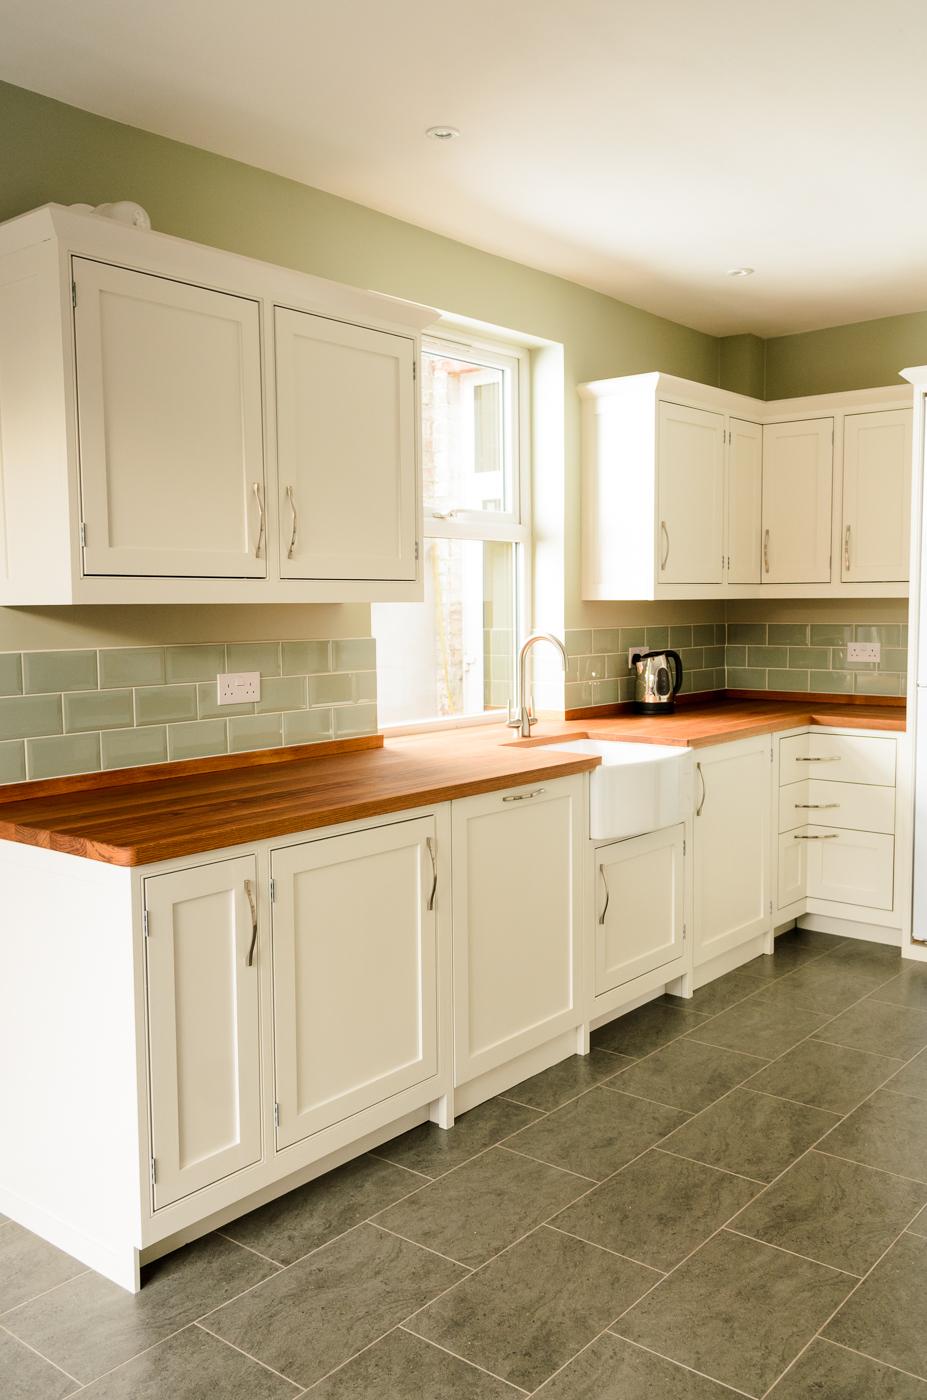 Rushworth Kitchen-Open Plan Design.jpg